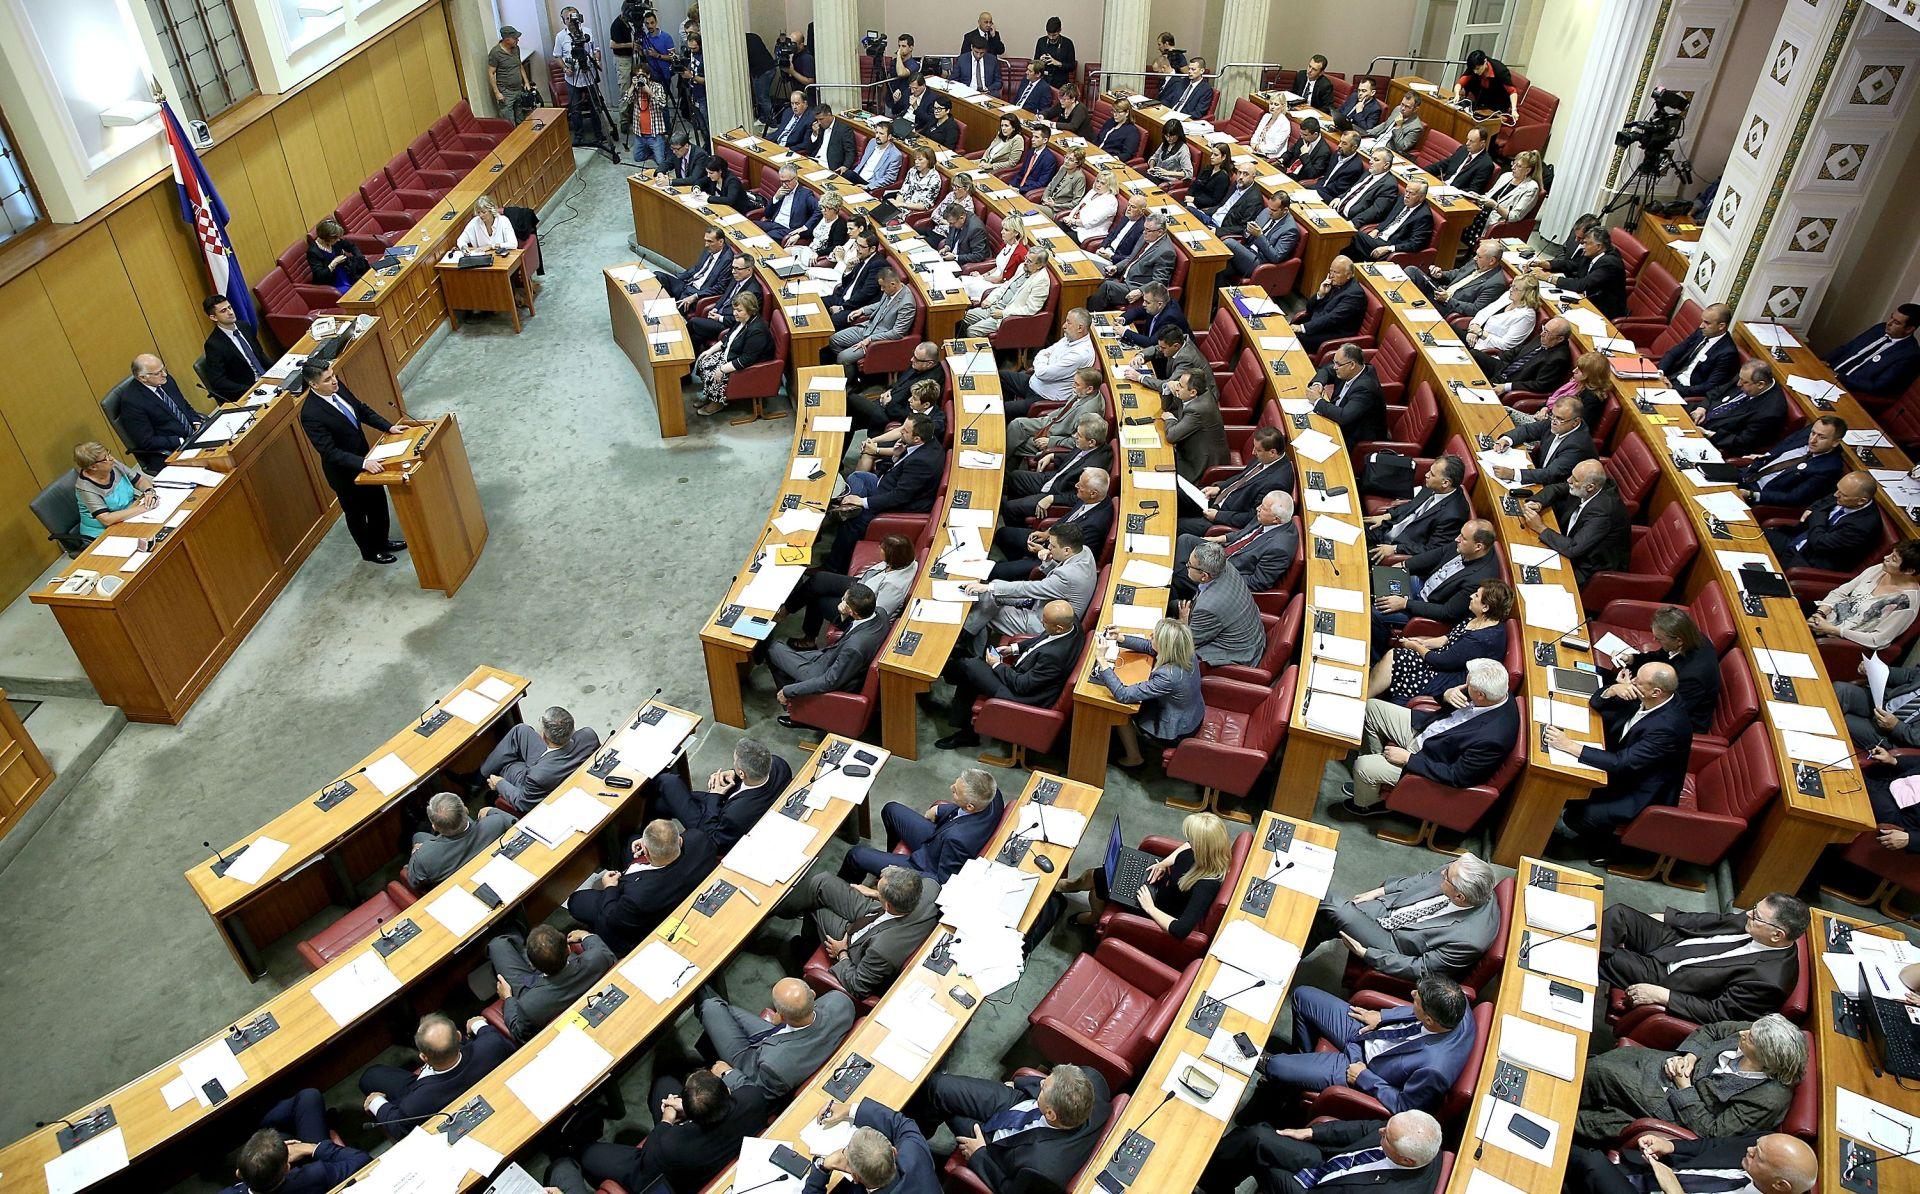 SABOR RH: Zahtjevi za mirovanjima mandata